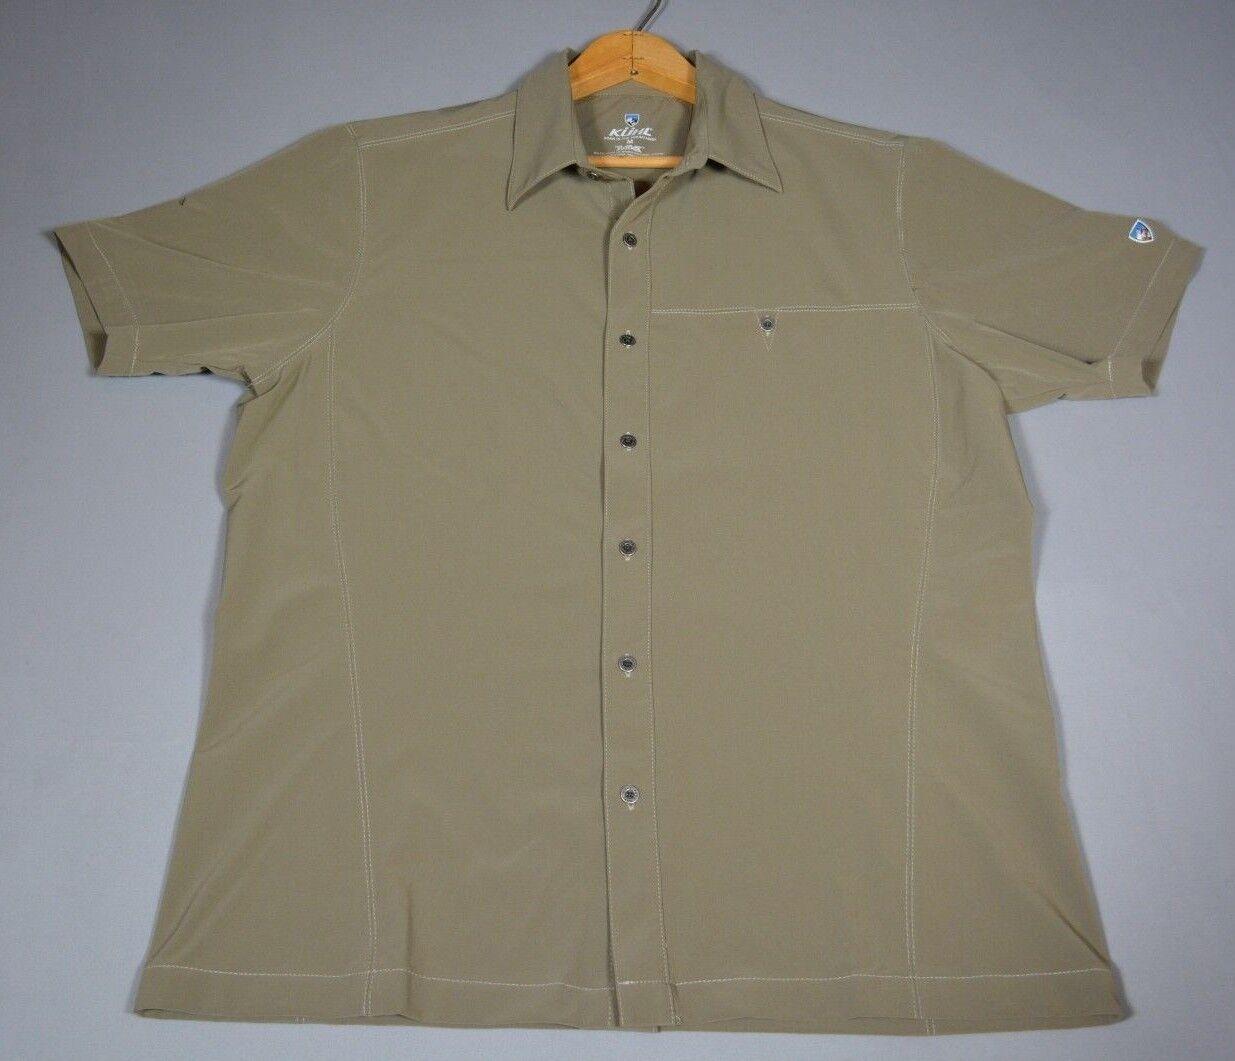 Kuhl Renegade TuffleX Shirt - Khaki - Size M